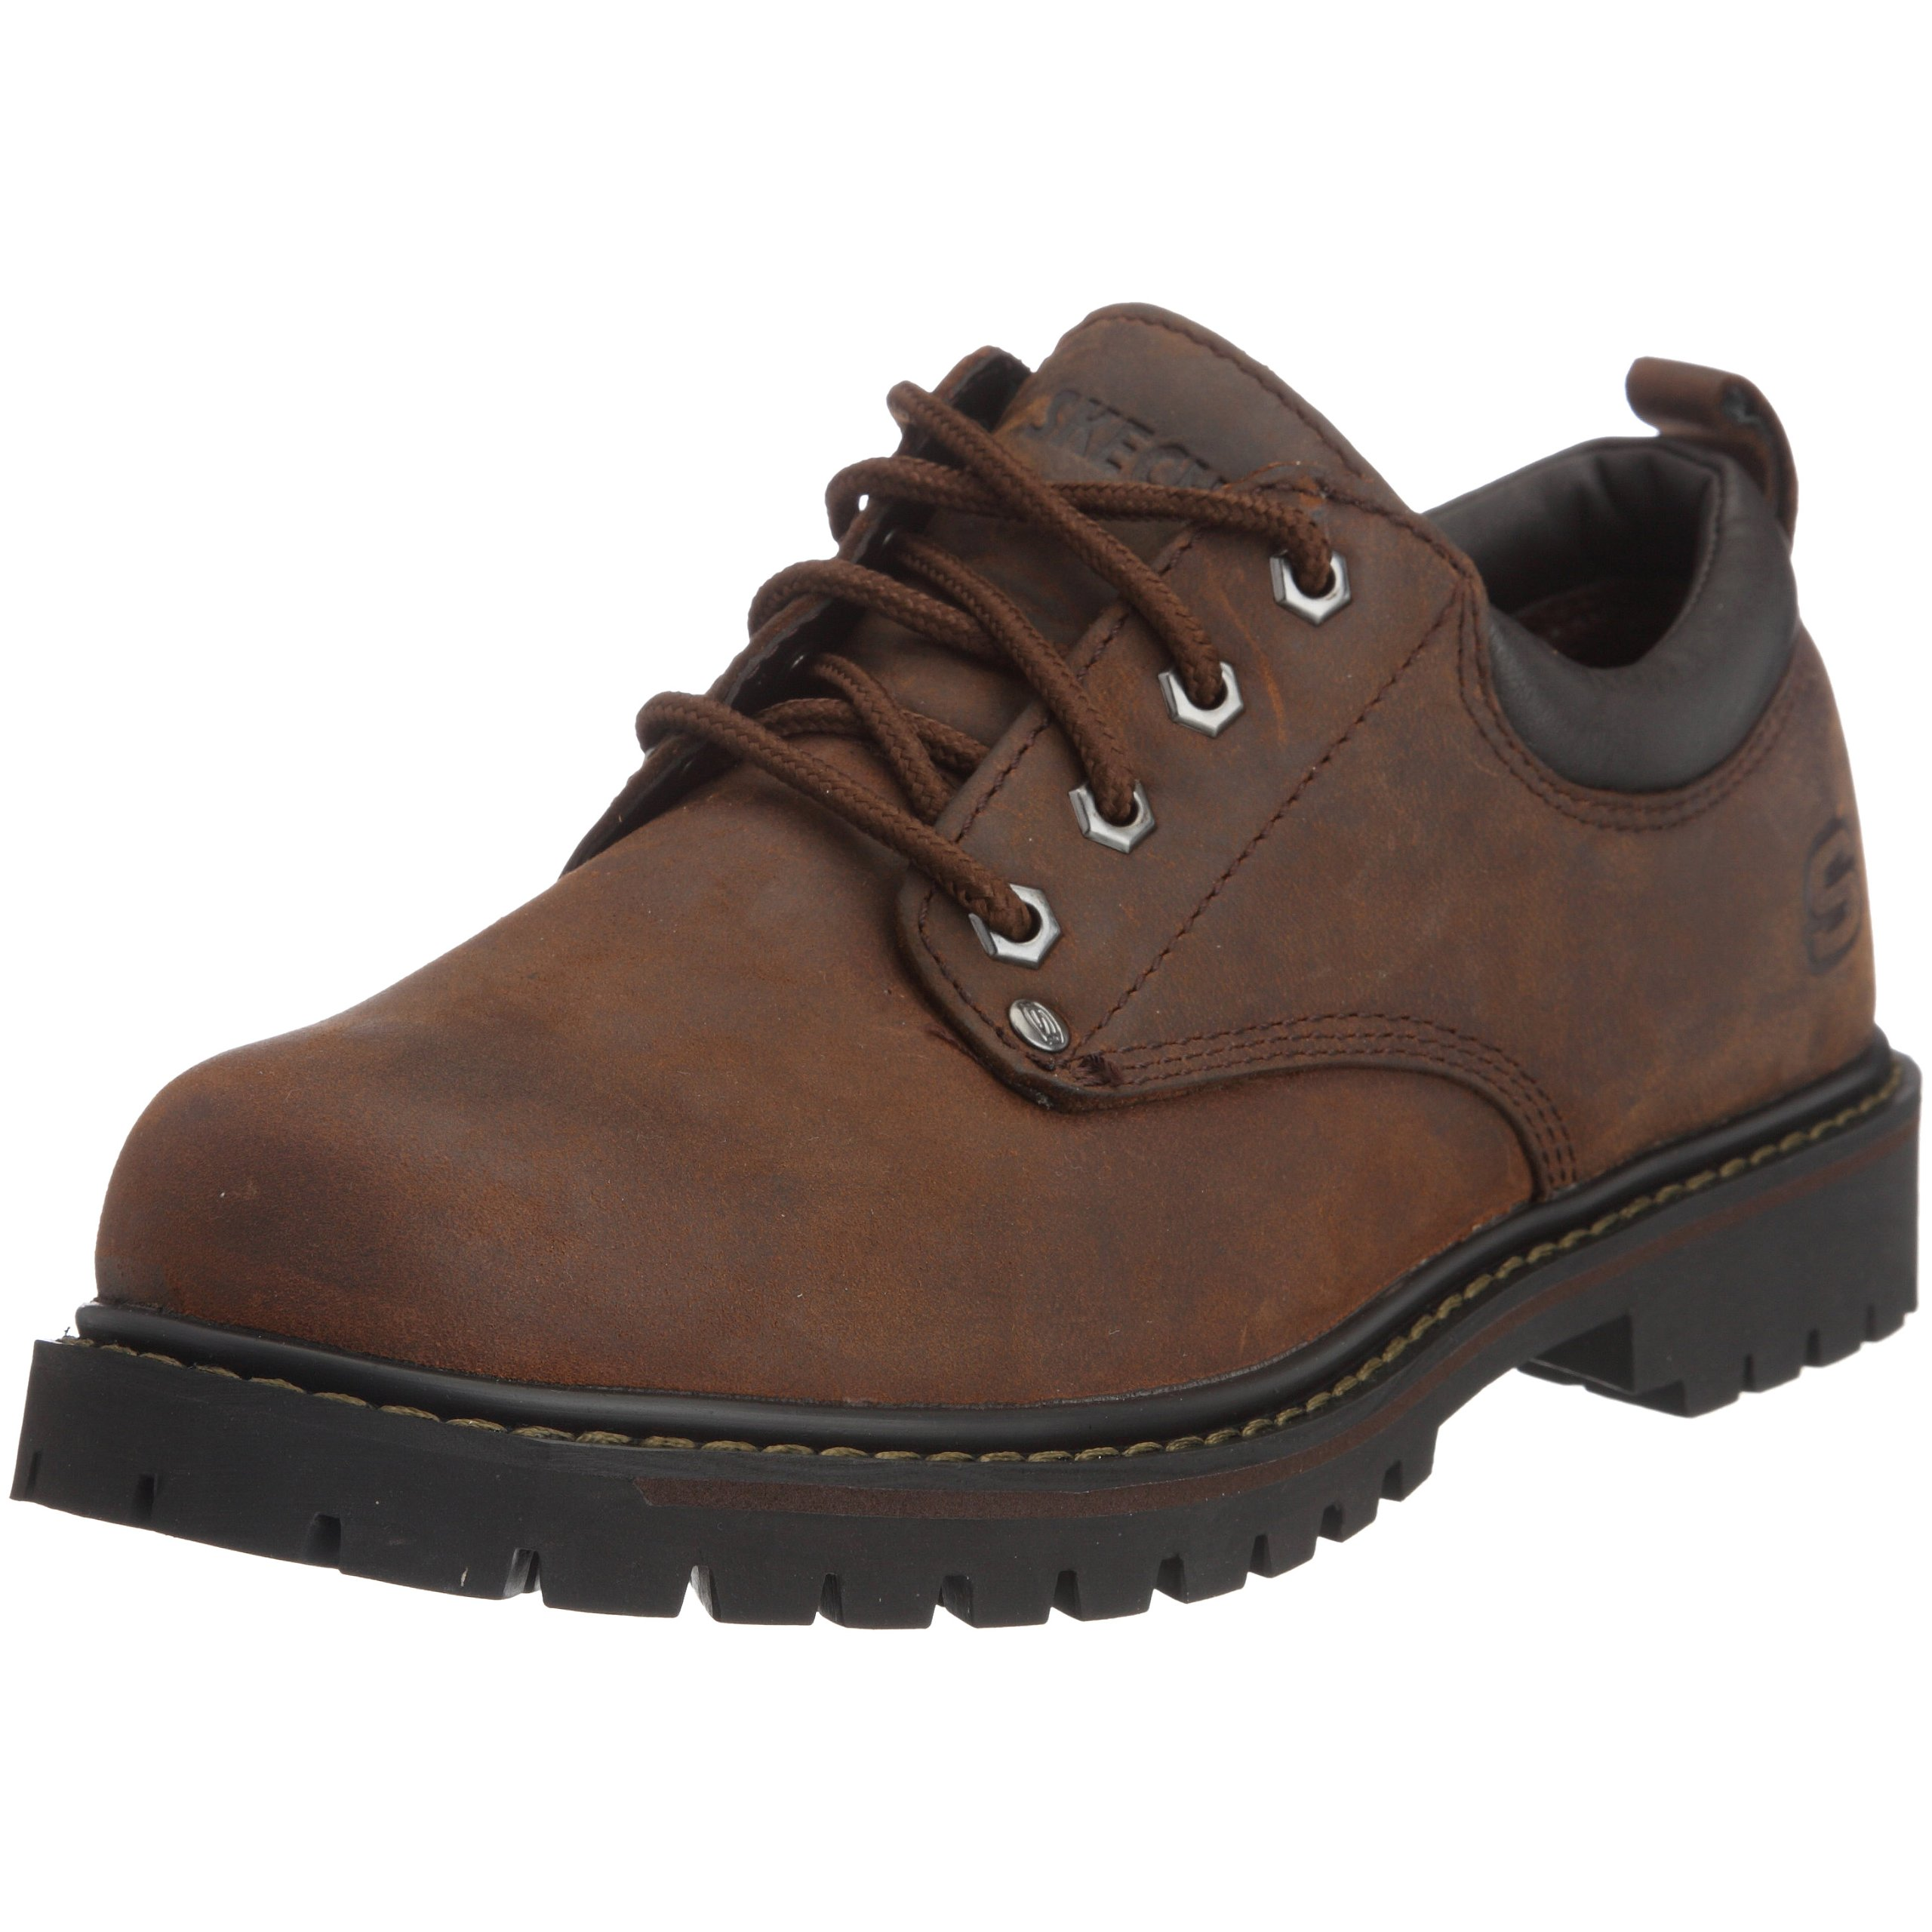 Skechers USA Men's Tom Cats Utility Shoe, Dark Brown, 10.5 M US